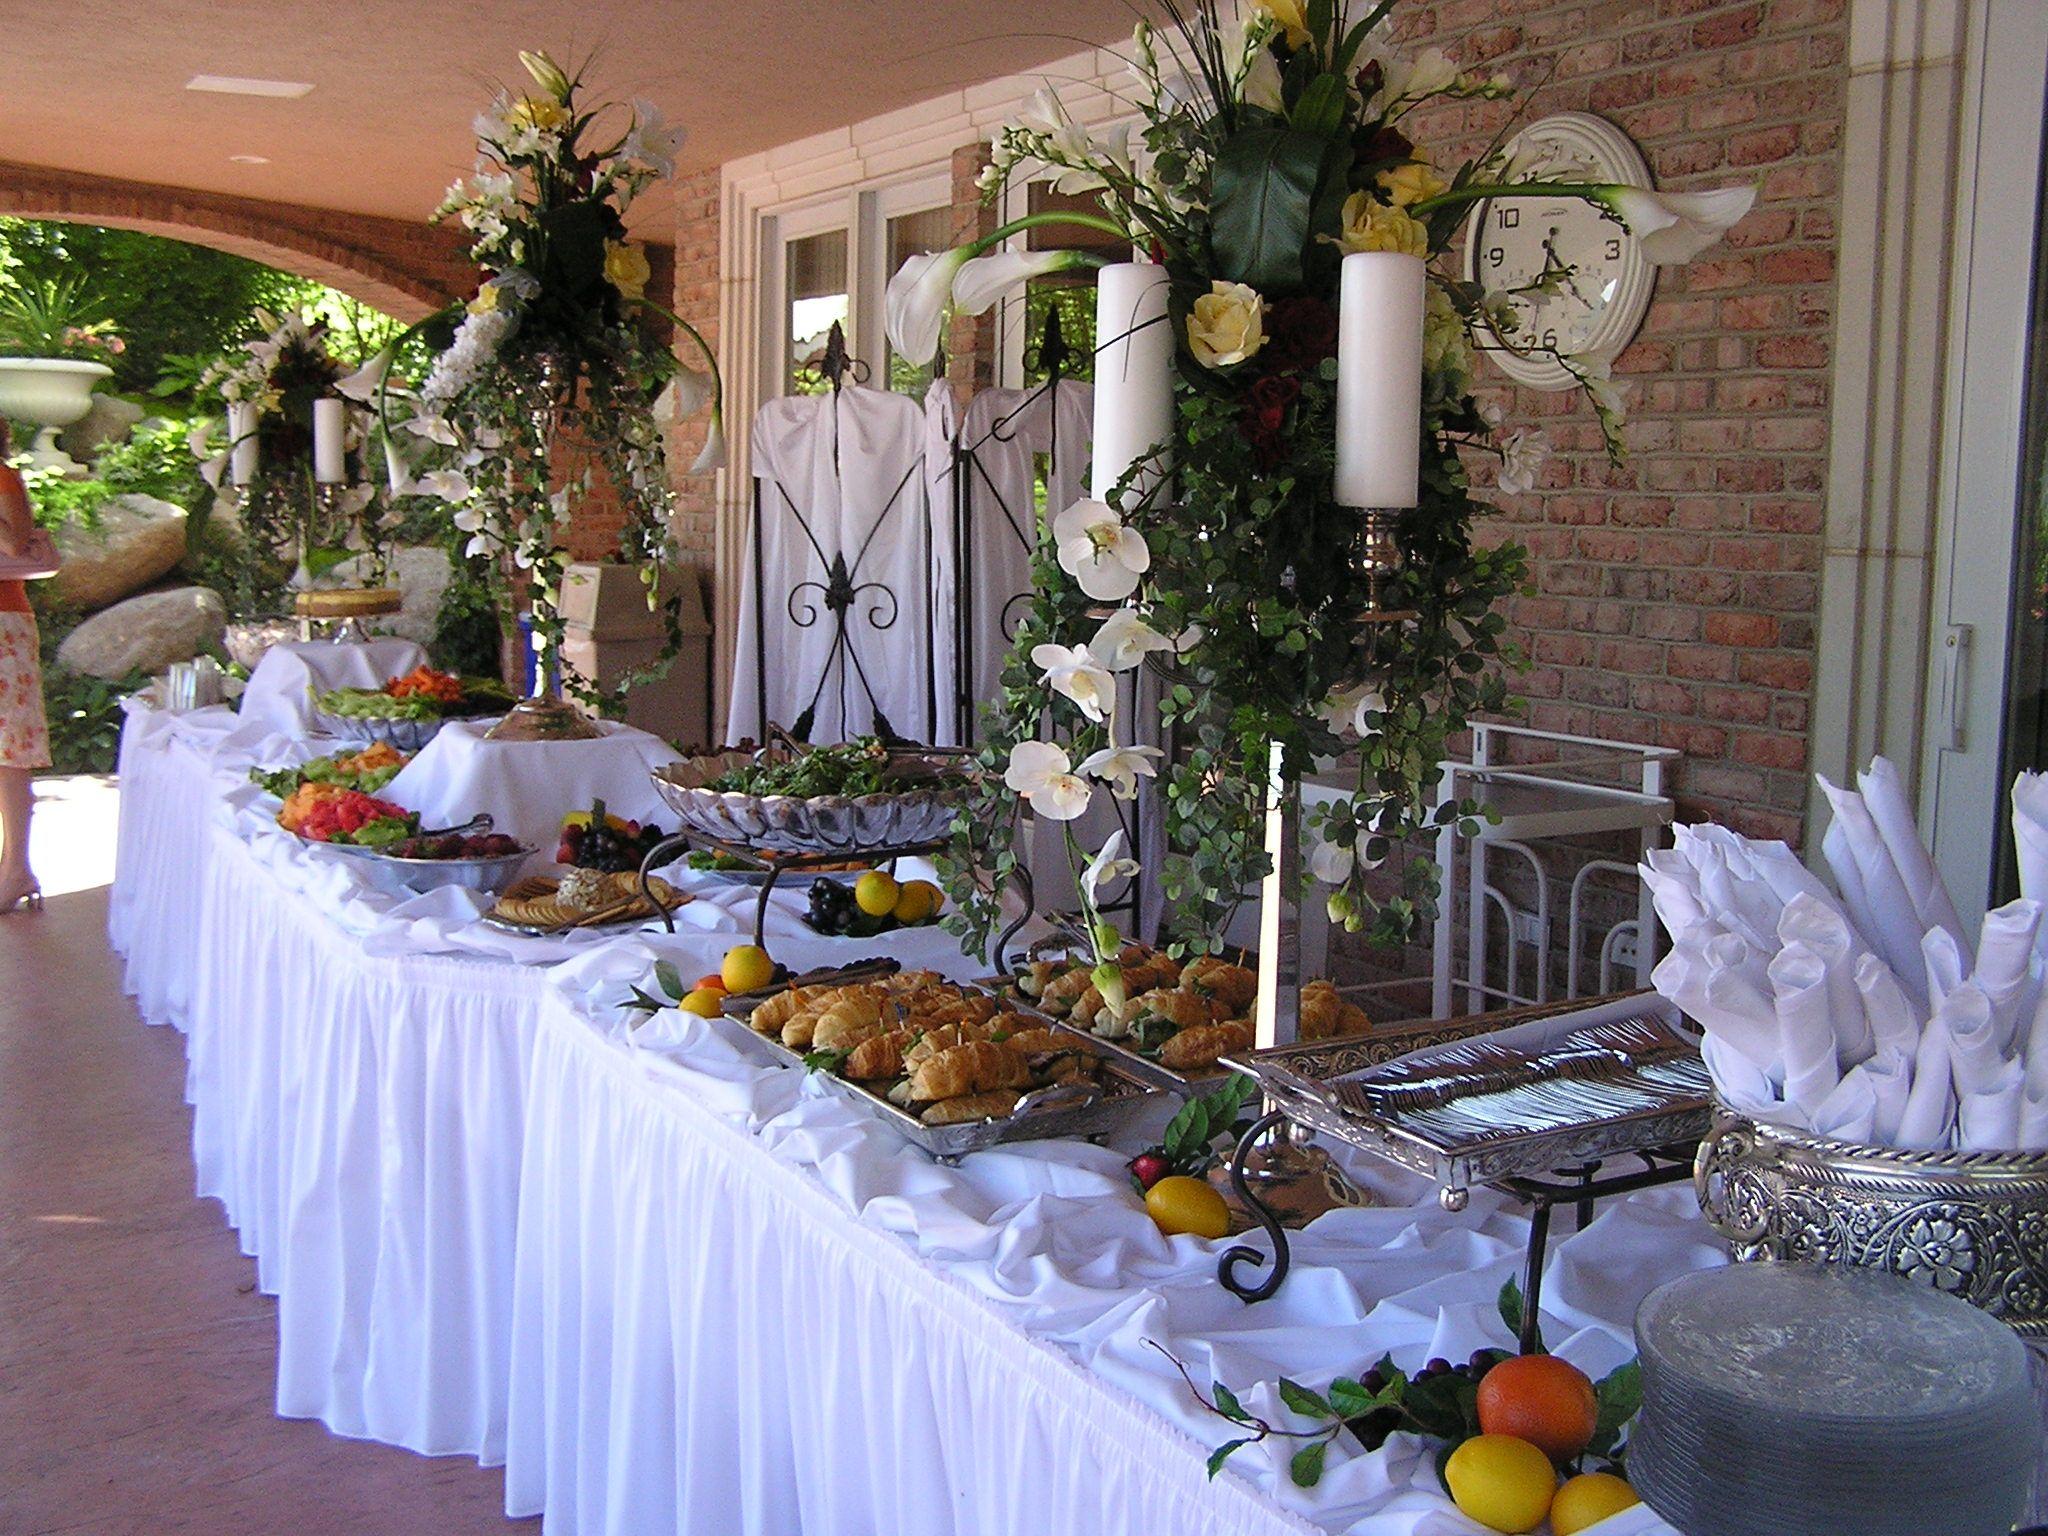 Wedding Banquet Table Decorations Buffet Table Decor Banquet